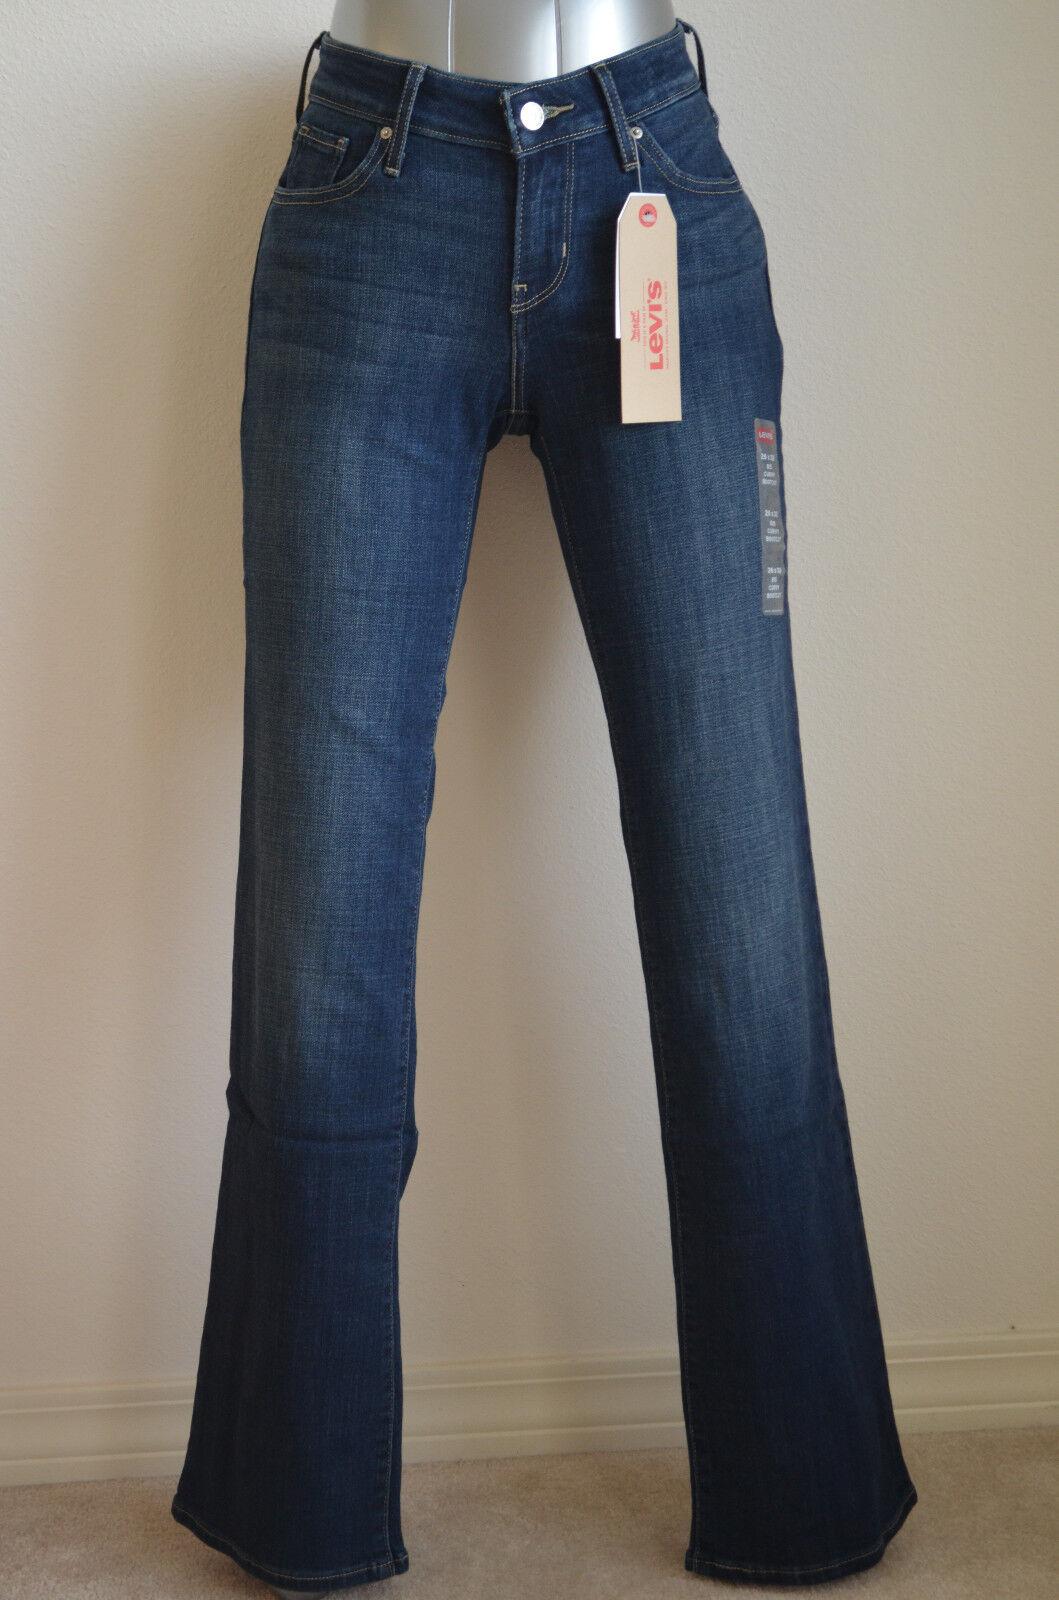 Shower levis petite curvy bootcut jeans lancaster naked virgin